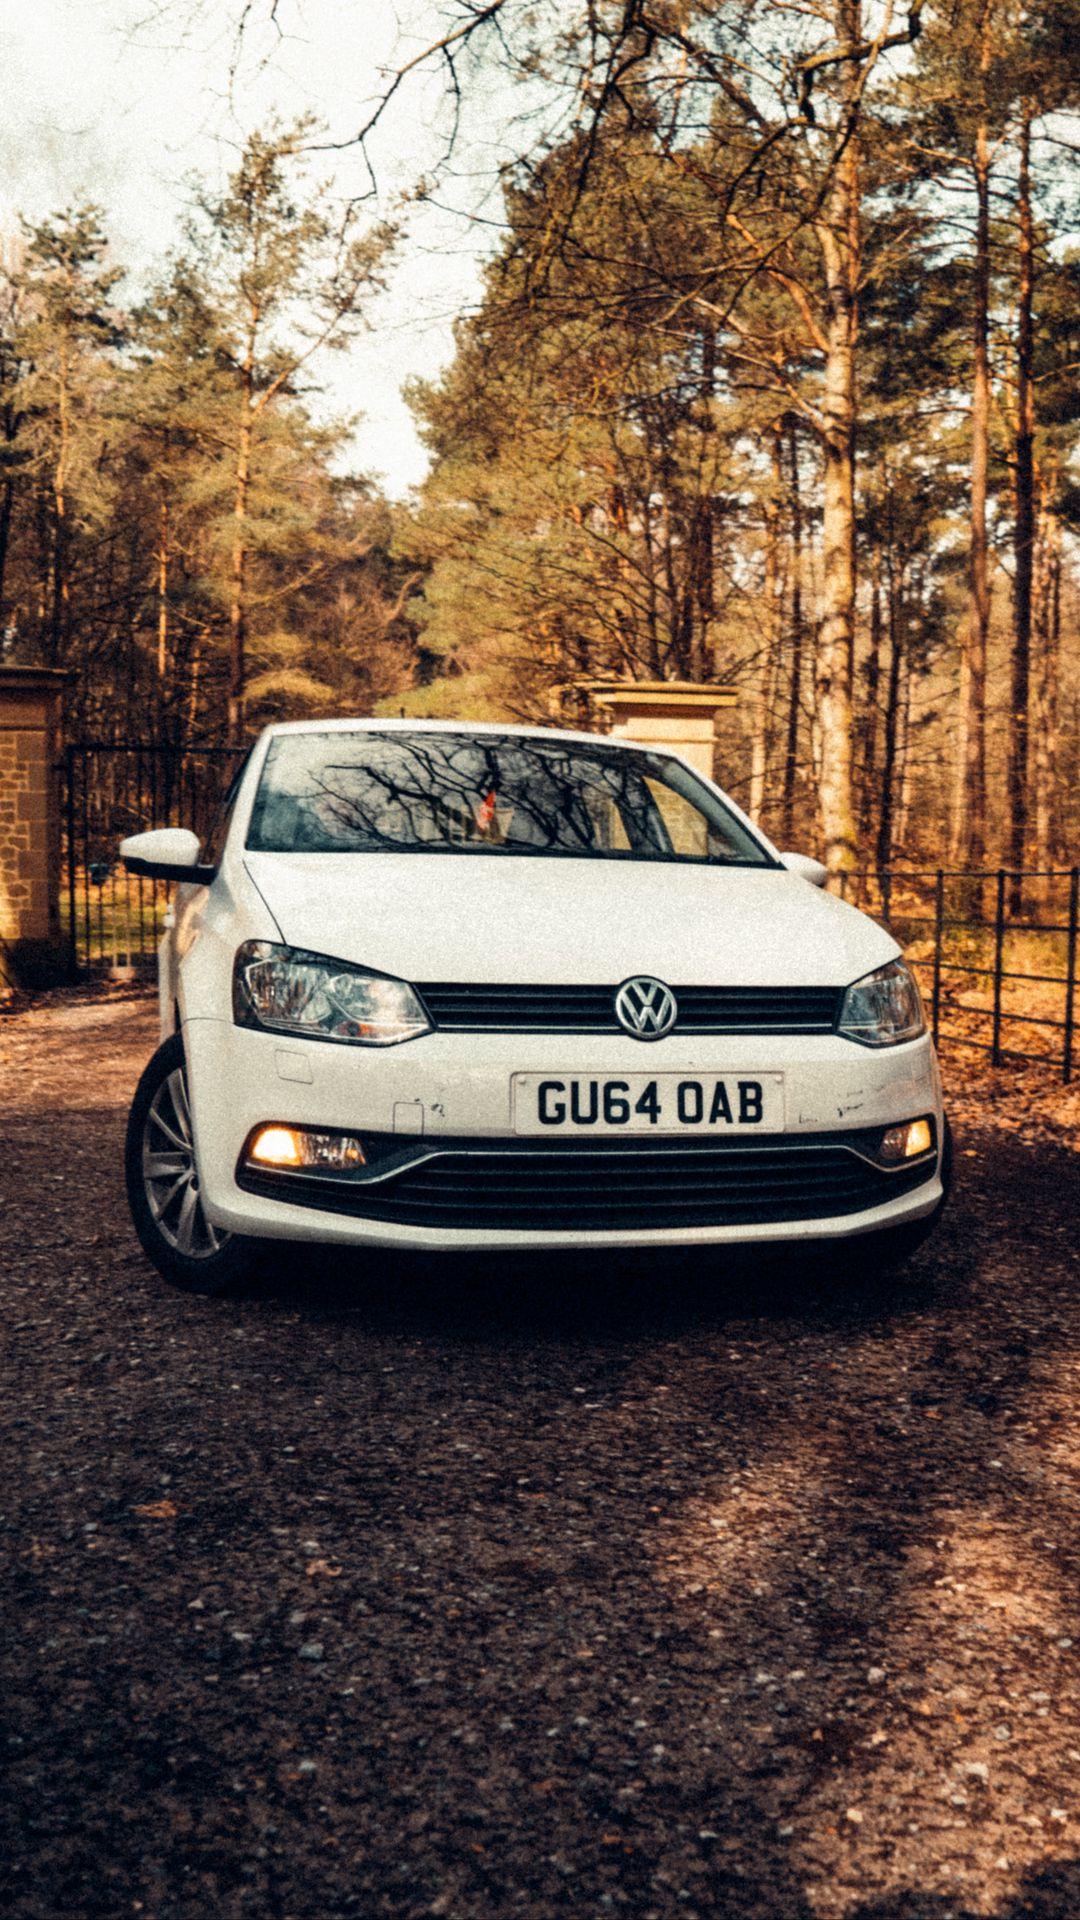 Volkswagen Polo Full HD Wallpapers Download